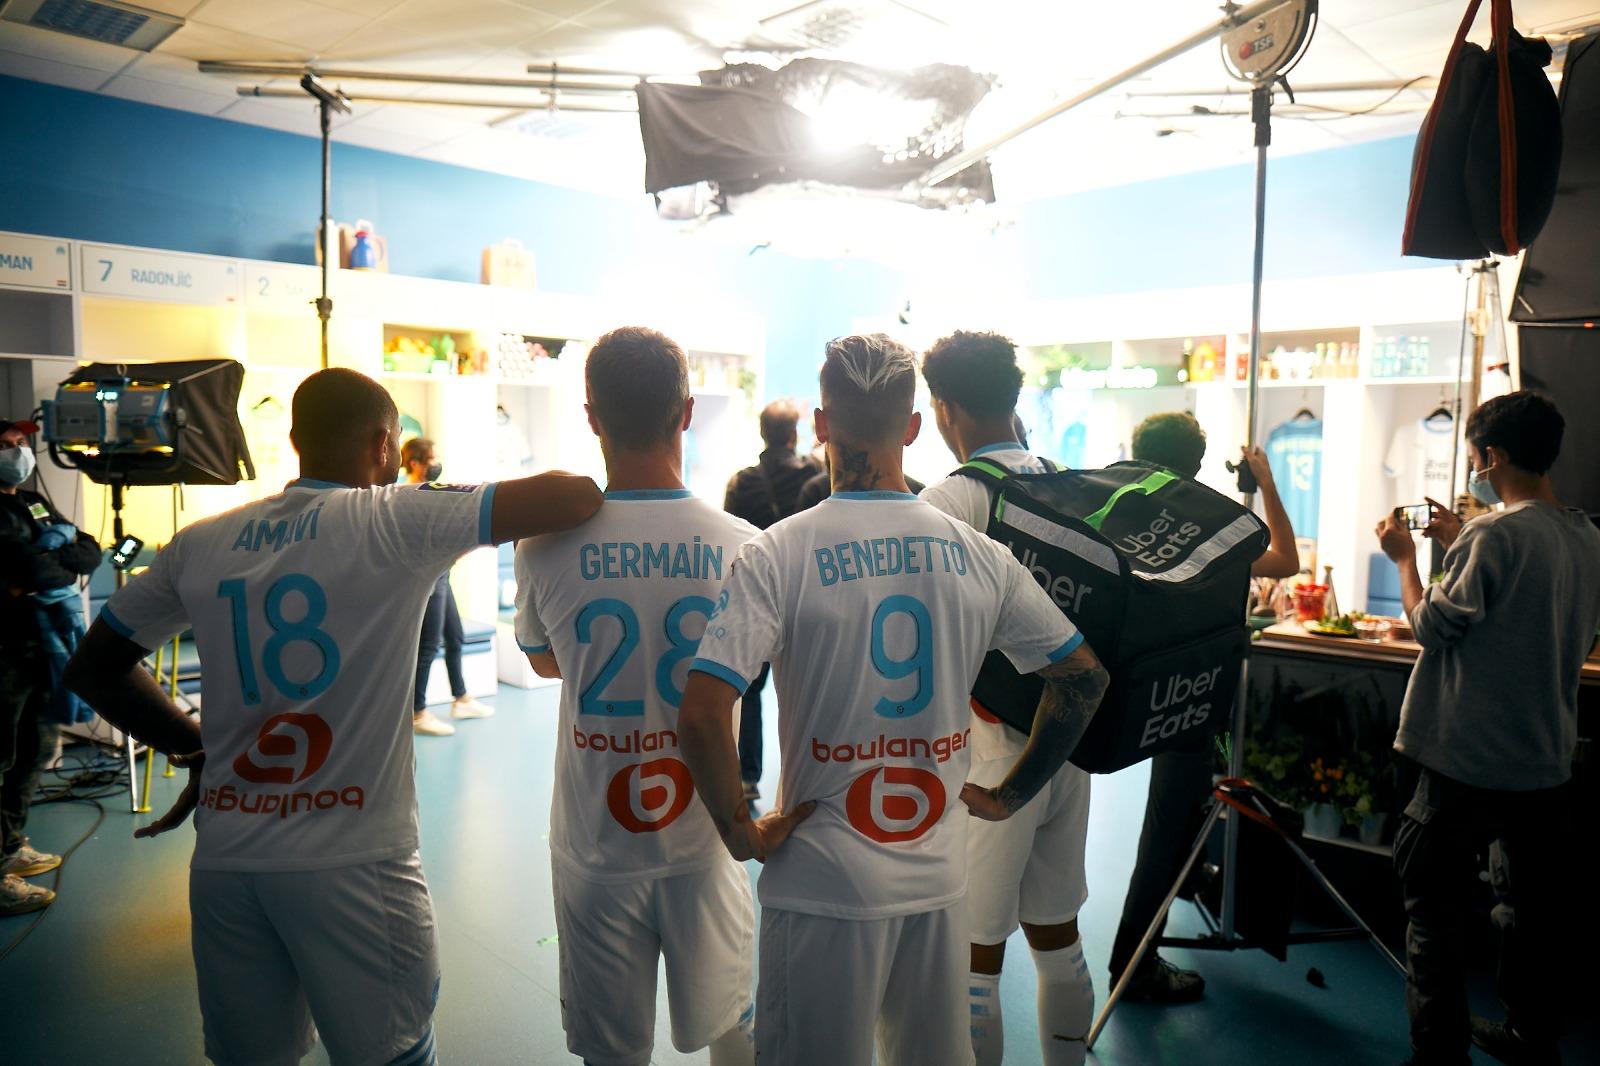 UE_FaimDEurope_OM_joueurs_marseille_om_ligue_des_champions_lafourmi.jpg